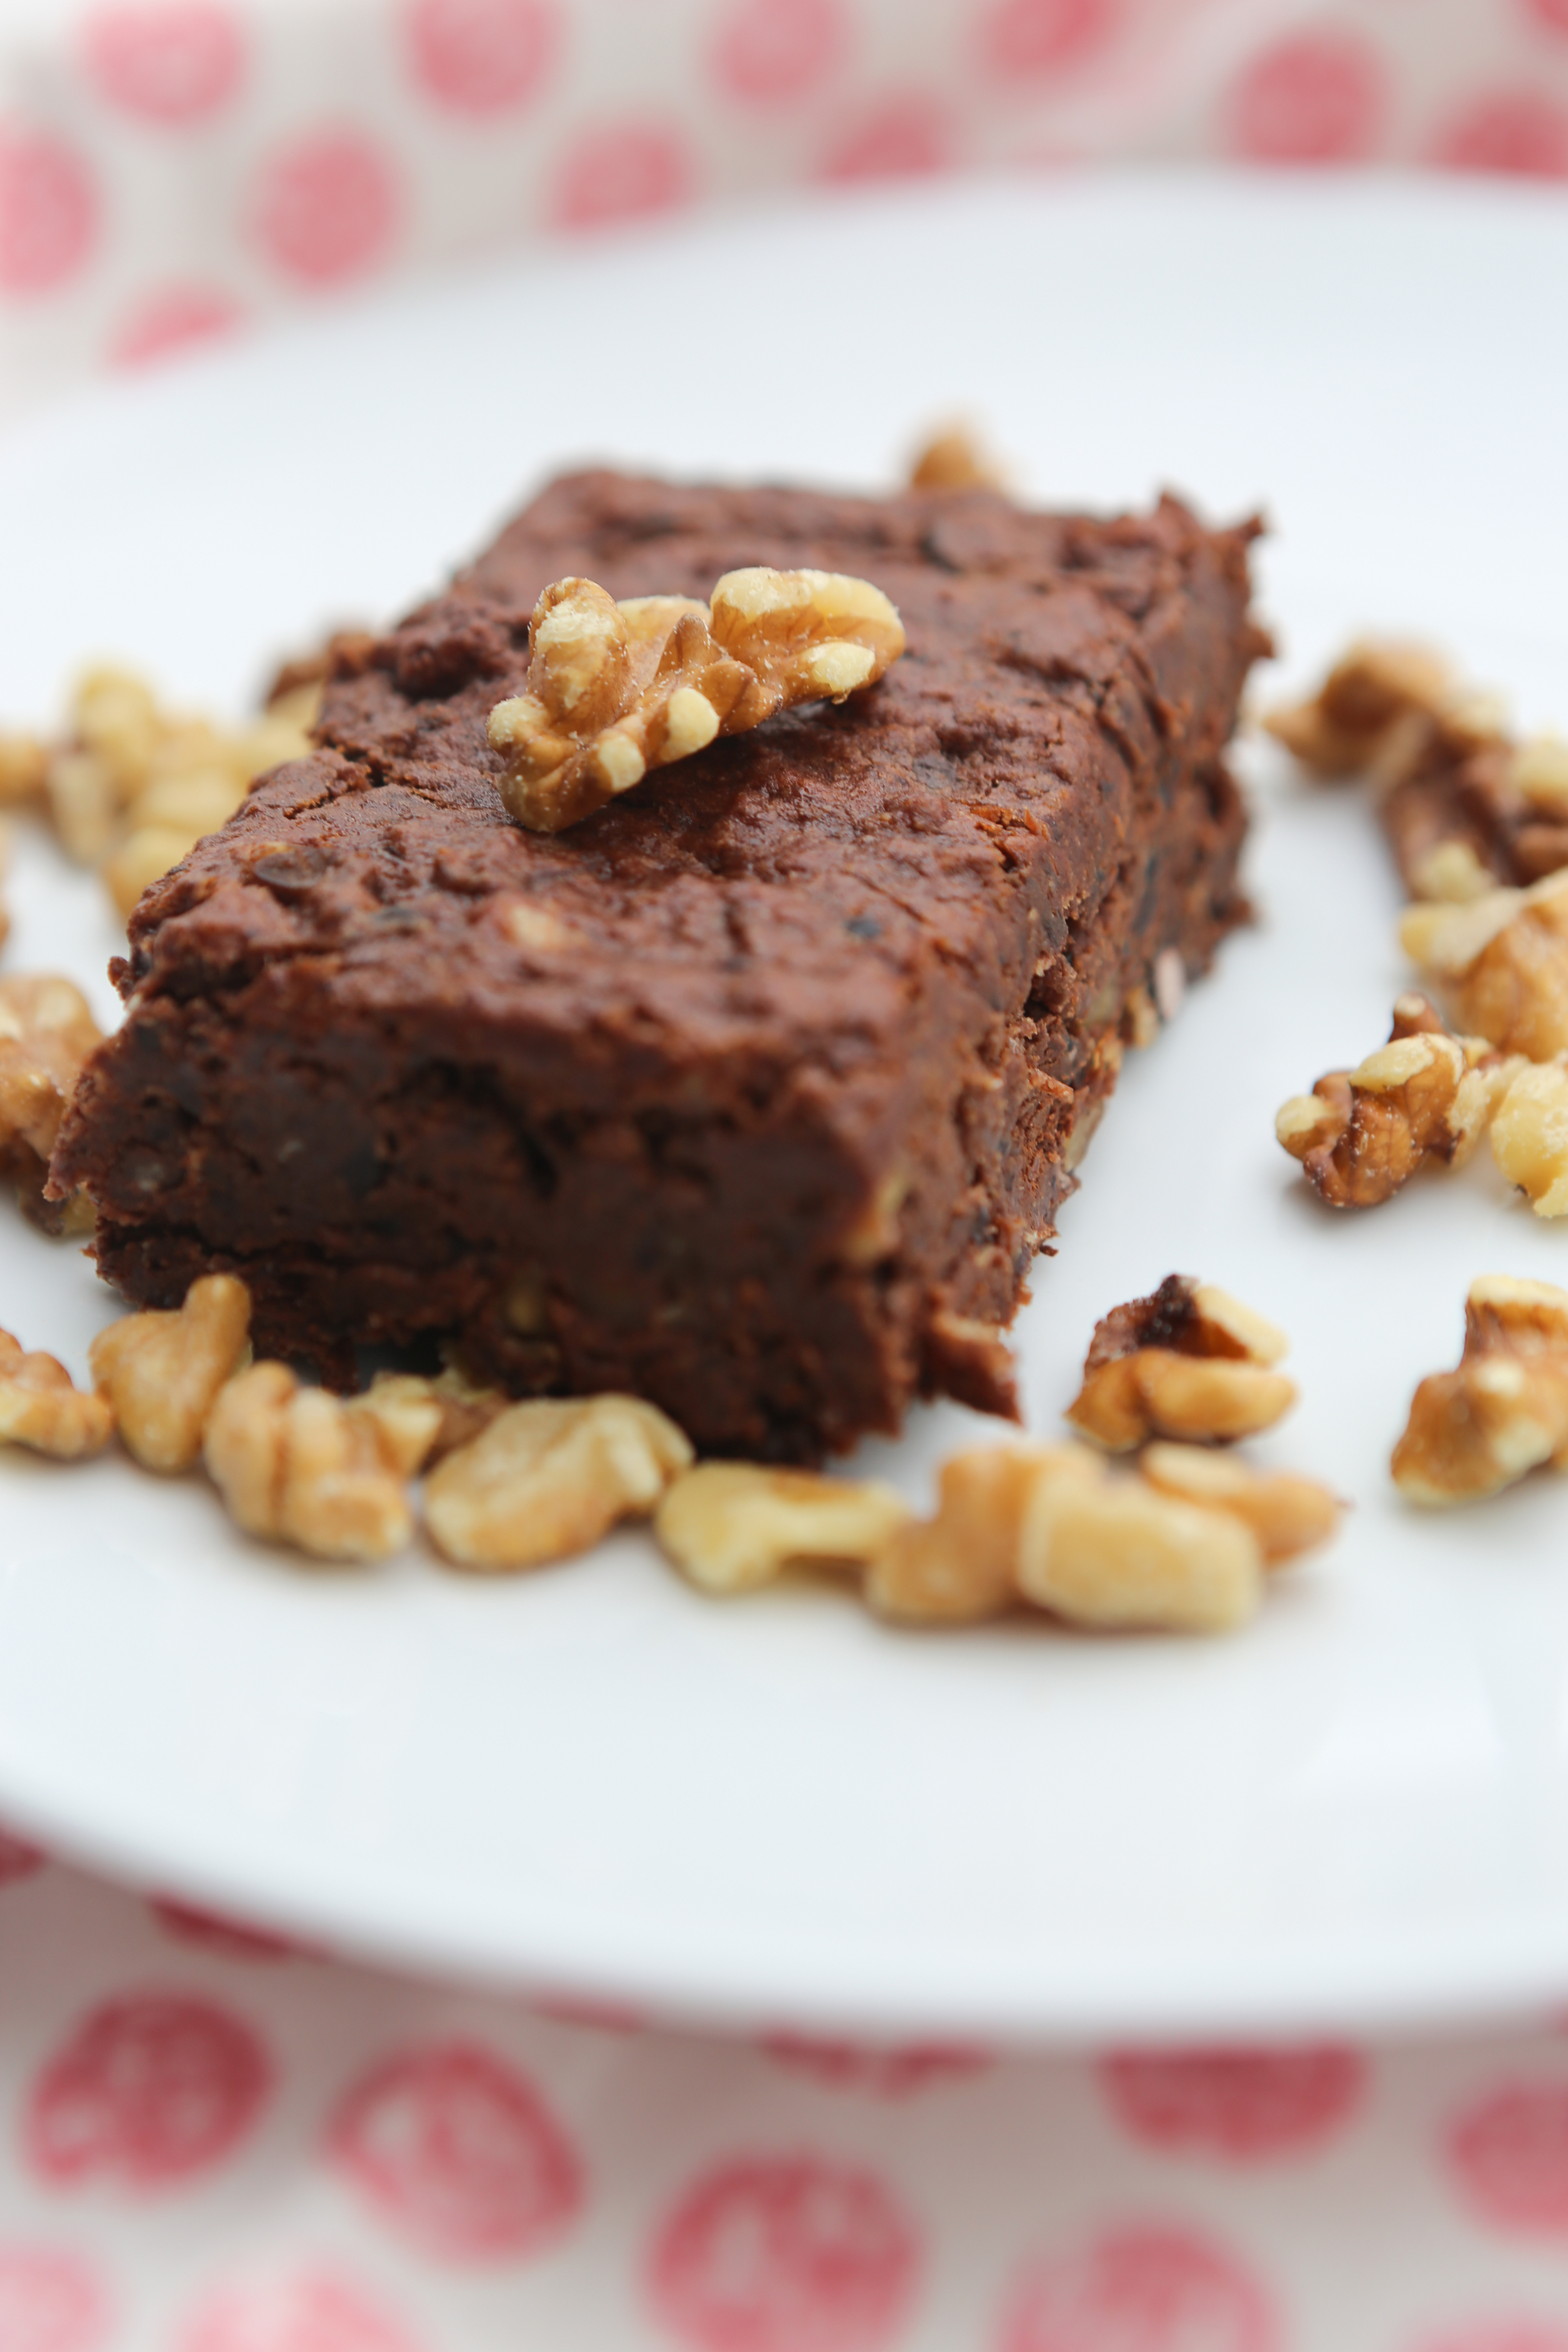 Gluten-free and vegan brownies. A. J. Crumblies:  www.ajcrumblies.com